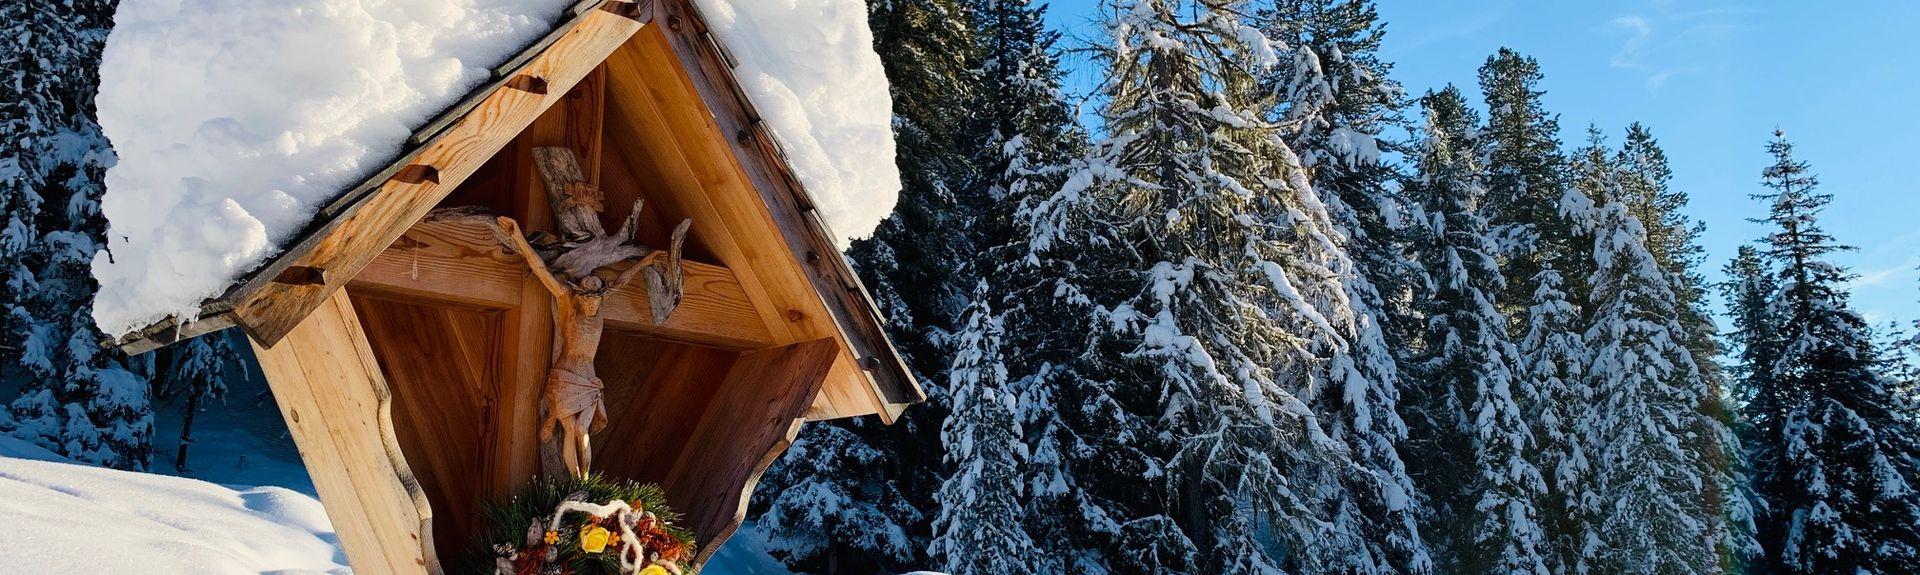 Chienes, Trentino-Zuid-Tirol, Italië